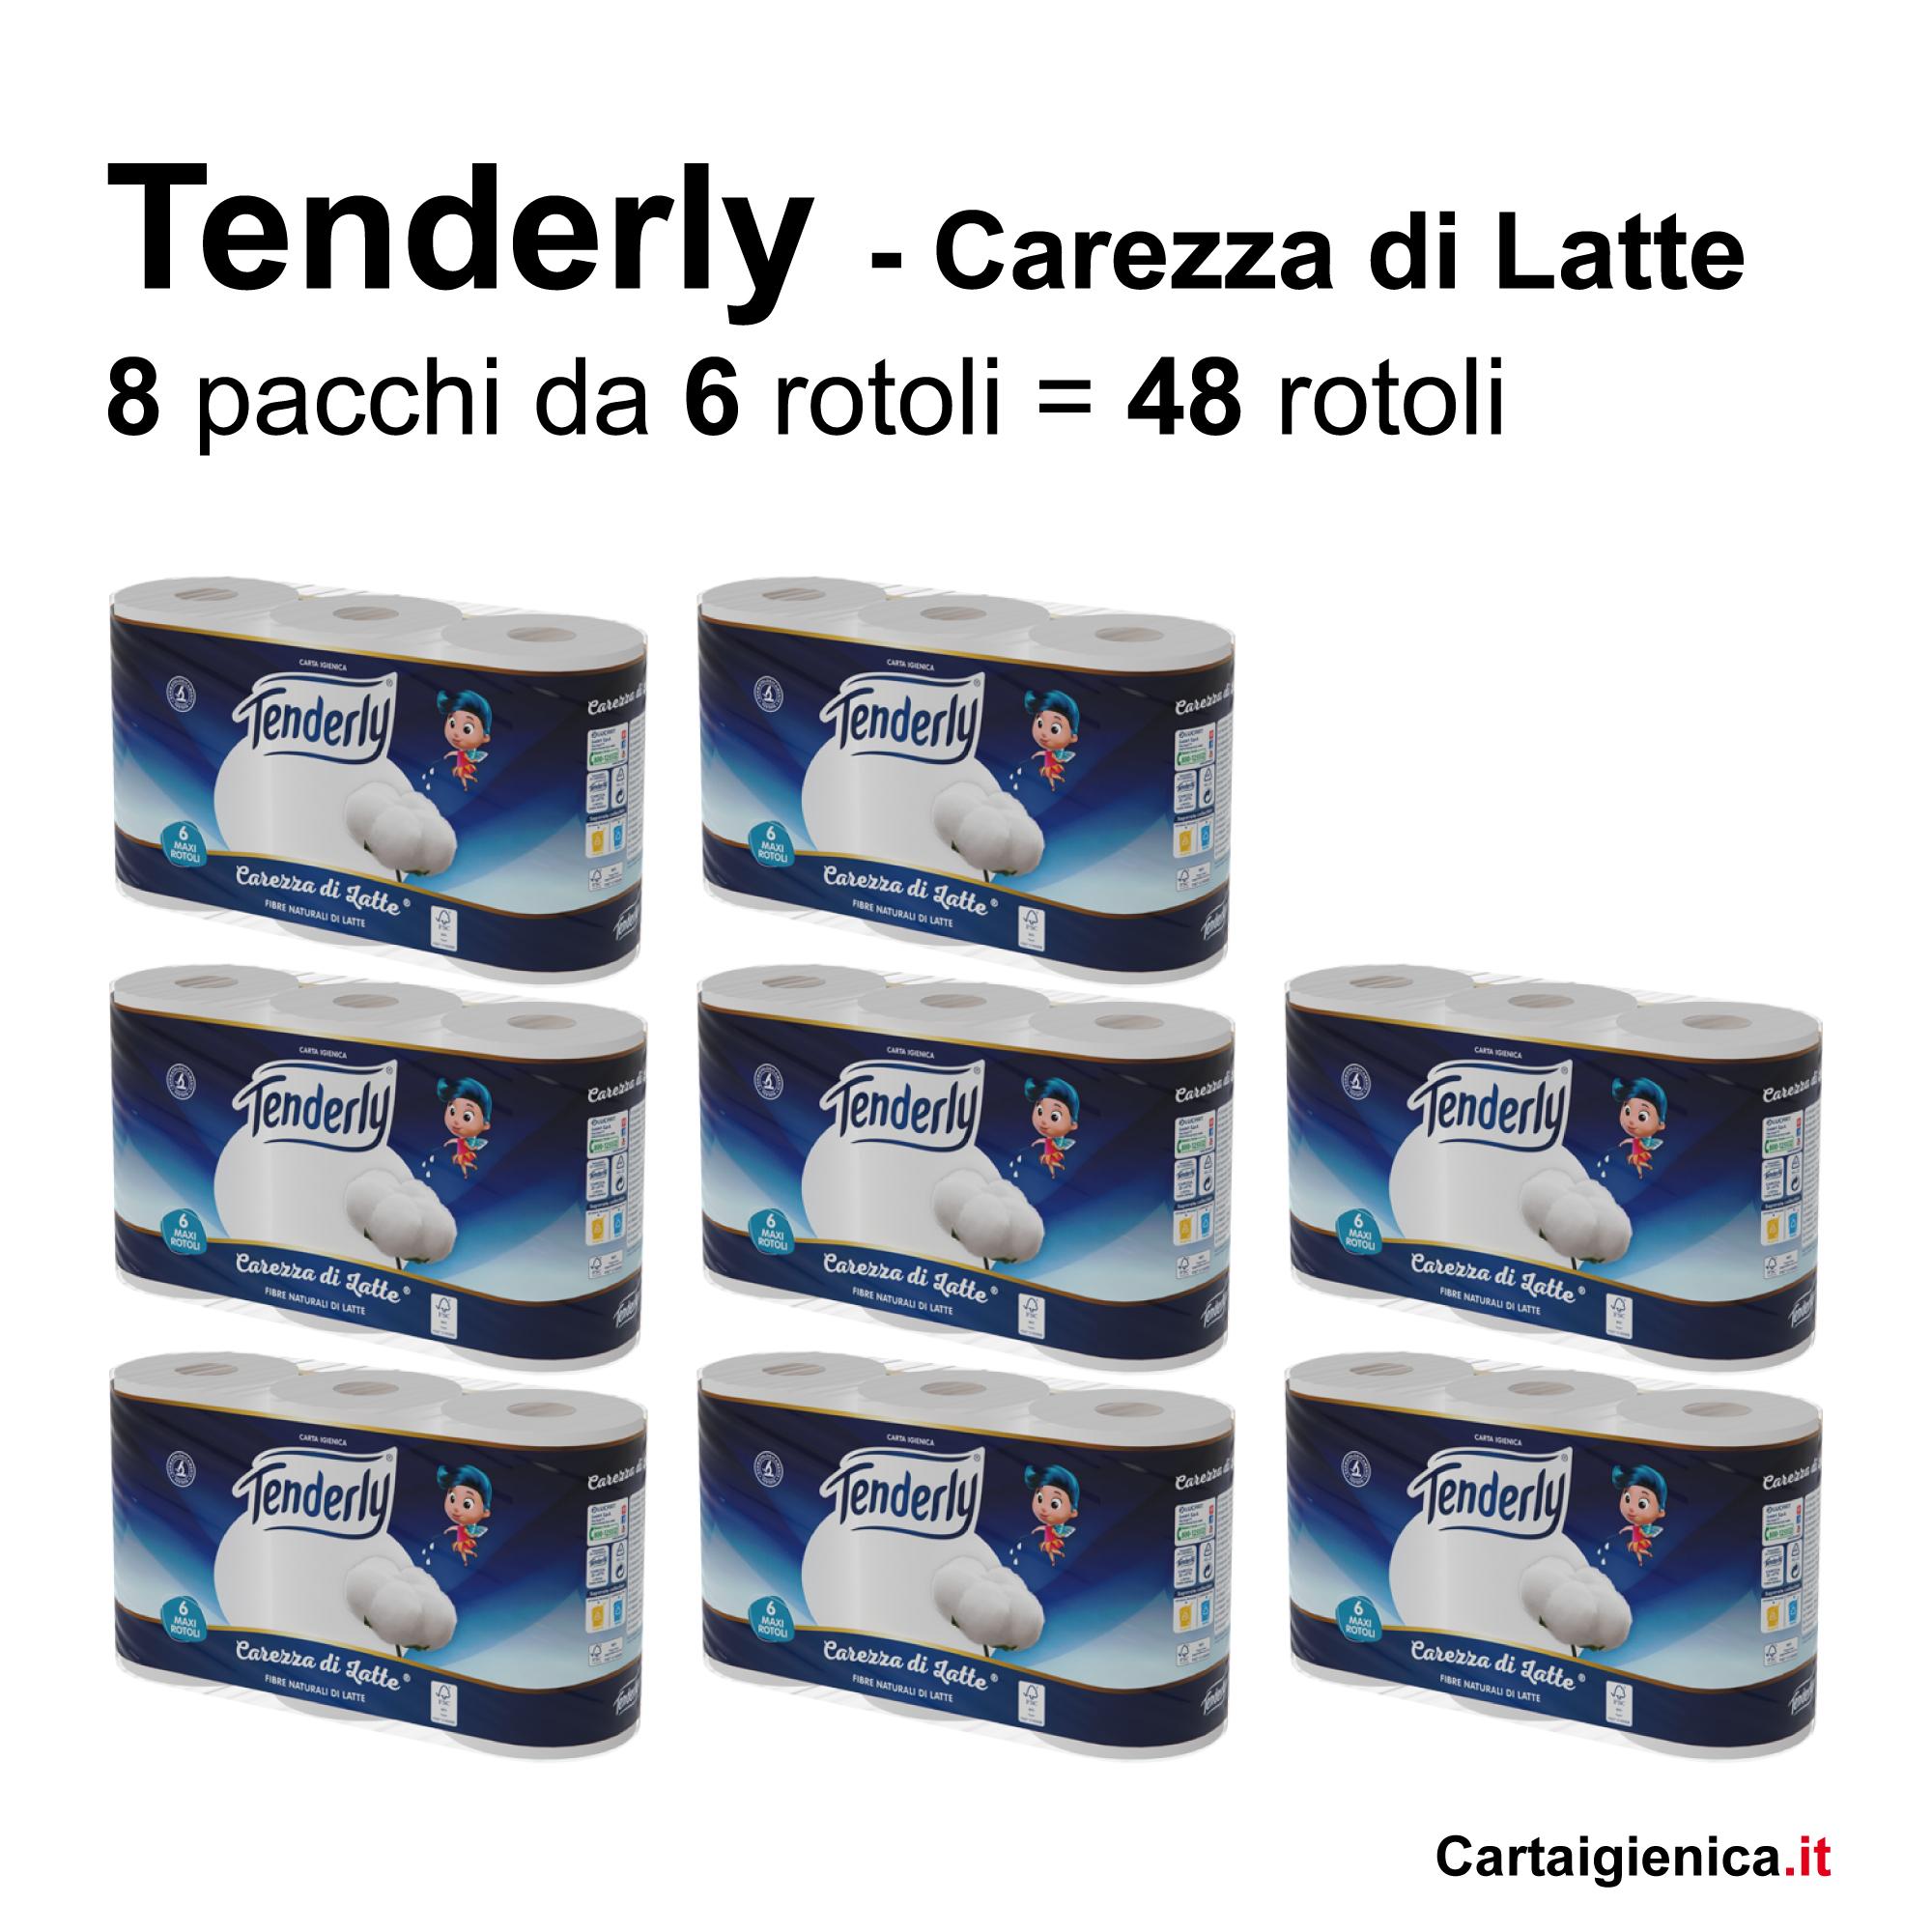 carta-igienica-tenderly-carezza-di-latte-48-rotoli